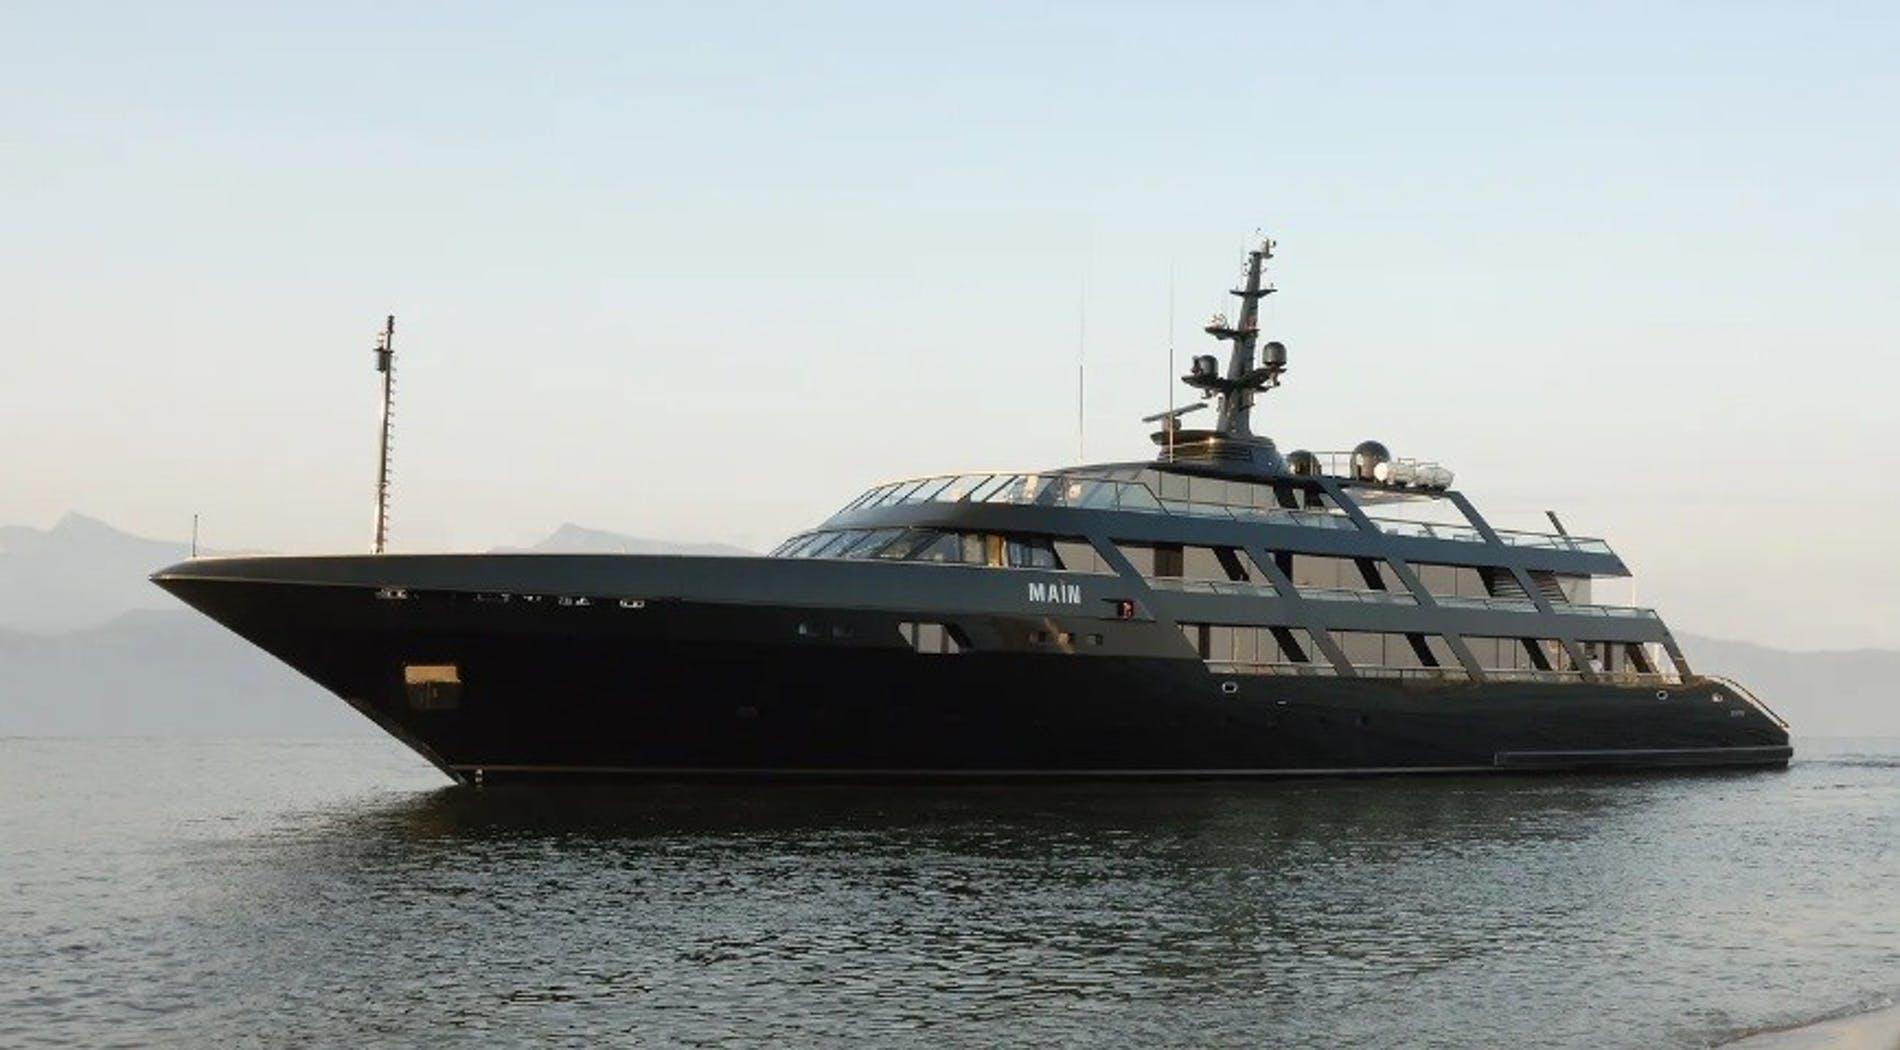 giorgio-armani-60-milion-yatcht-style-1.jpg